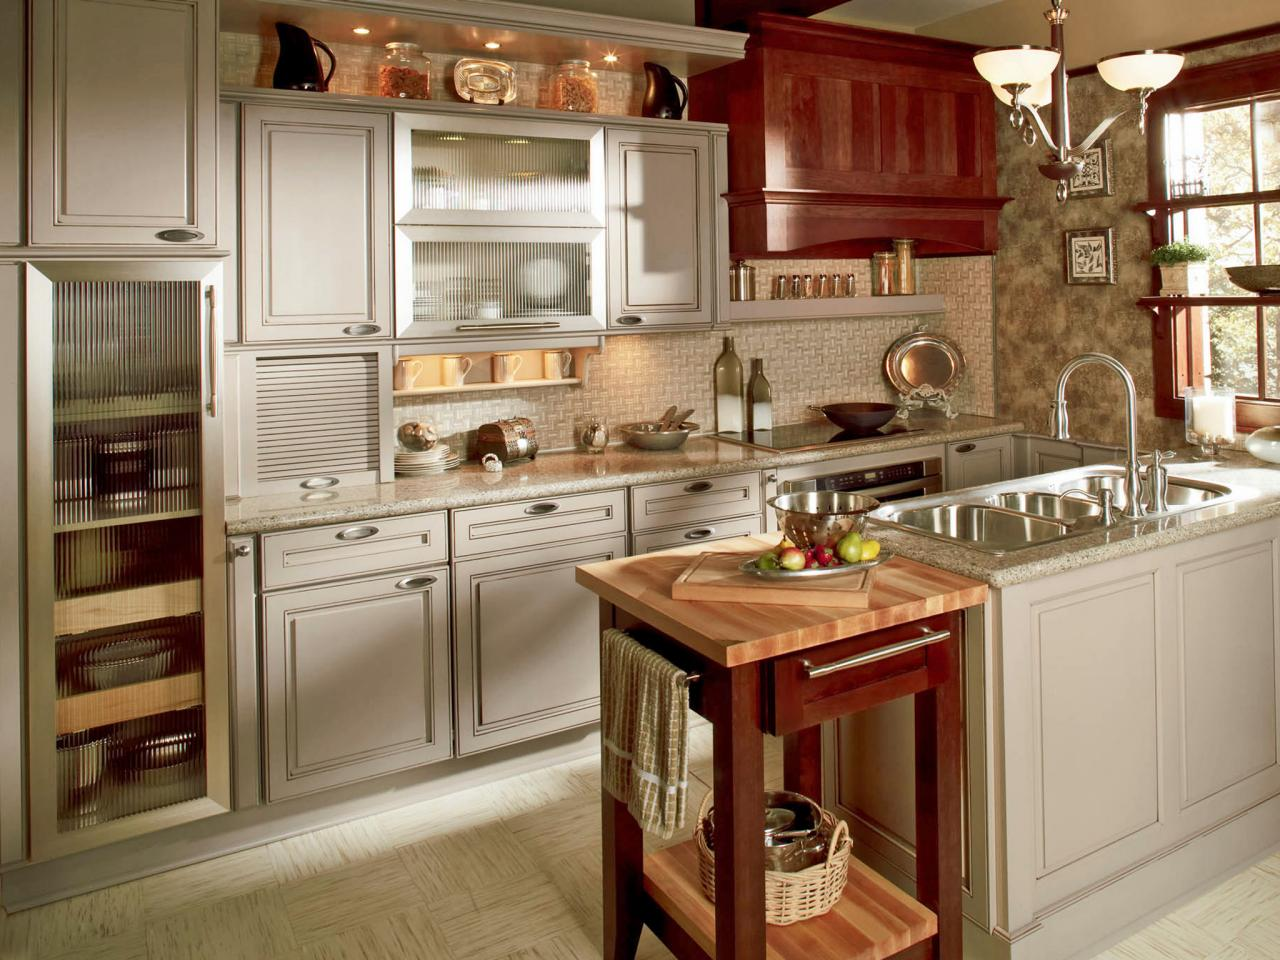 CI-Wellborn-Cabinets_soft-gray-painted-kitchen-cabinets_4x3.jpg.rend.hgtvcom.1280.960.jpeg